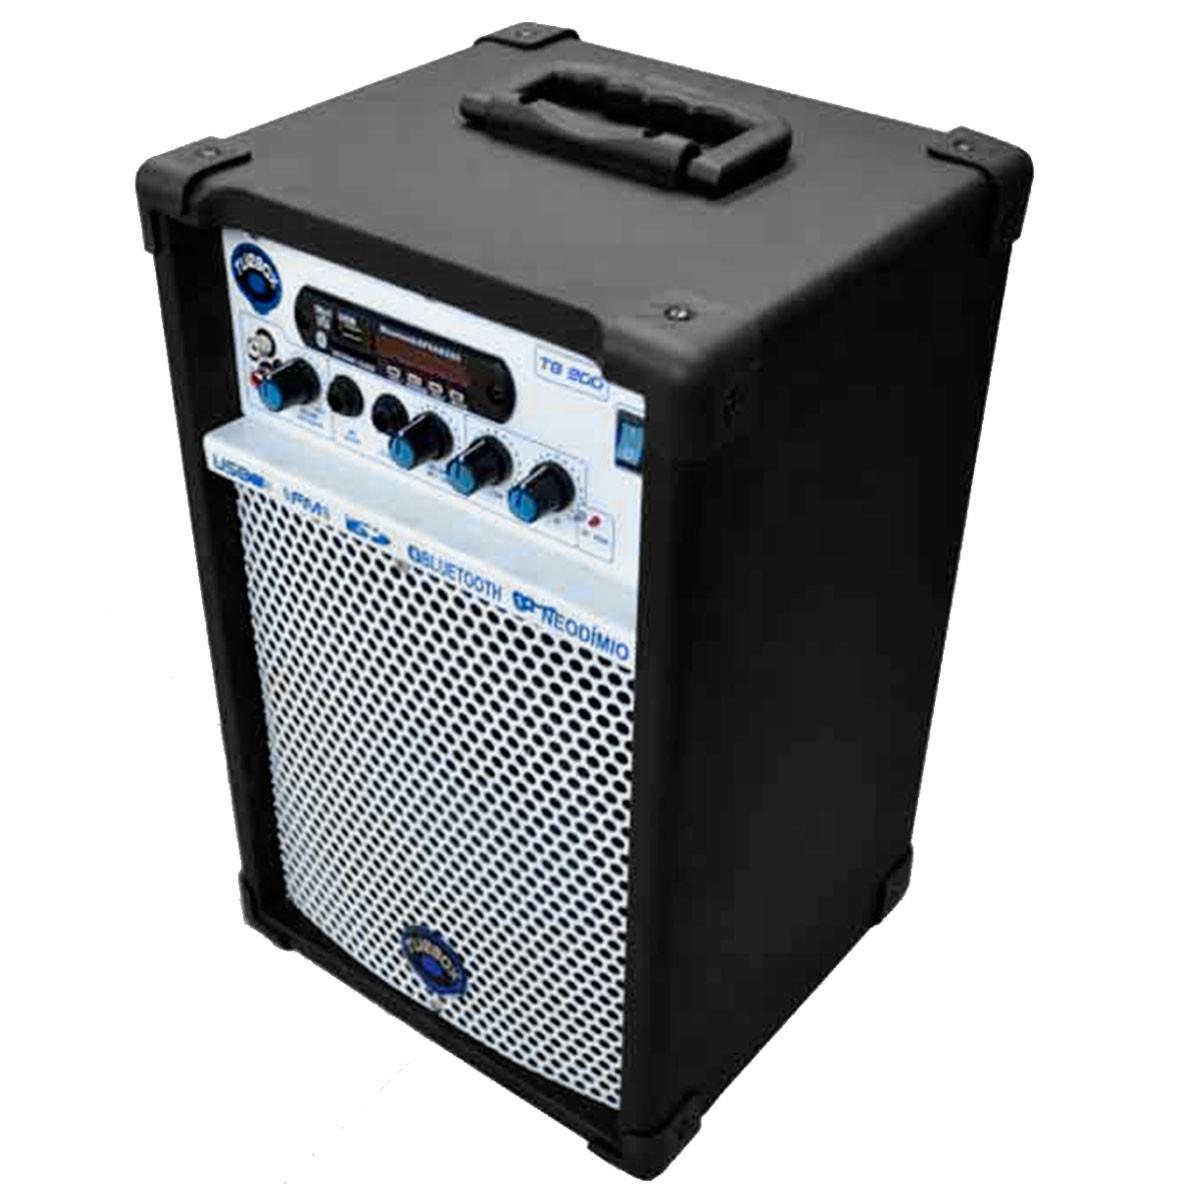 Cubo Multiuso Ativo Fal 8 Pol 50W c/ USB / Bluetooth - TB 300 Turbox